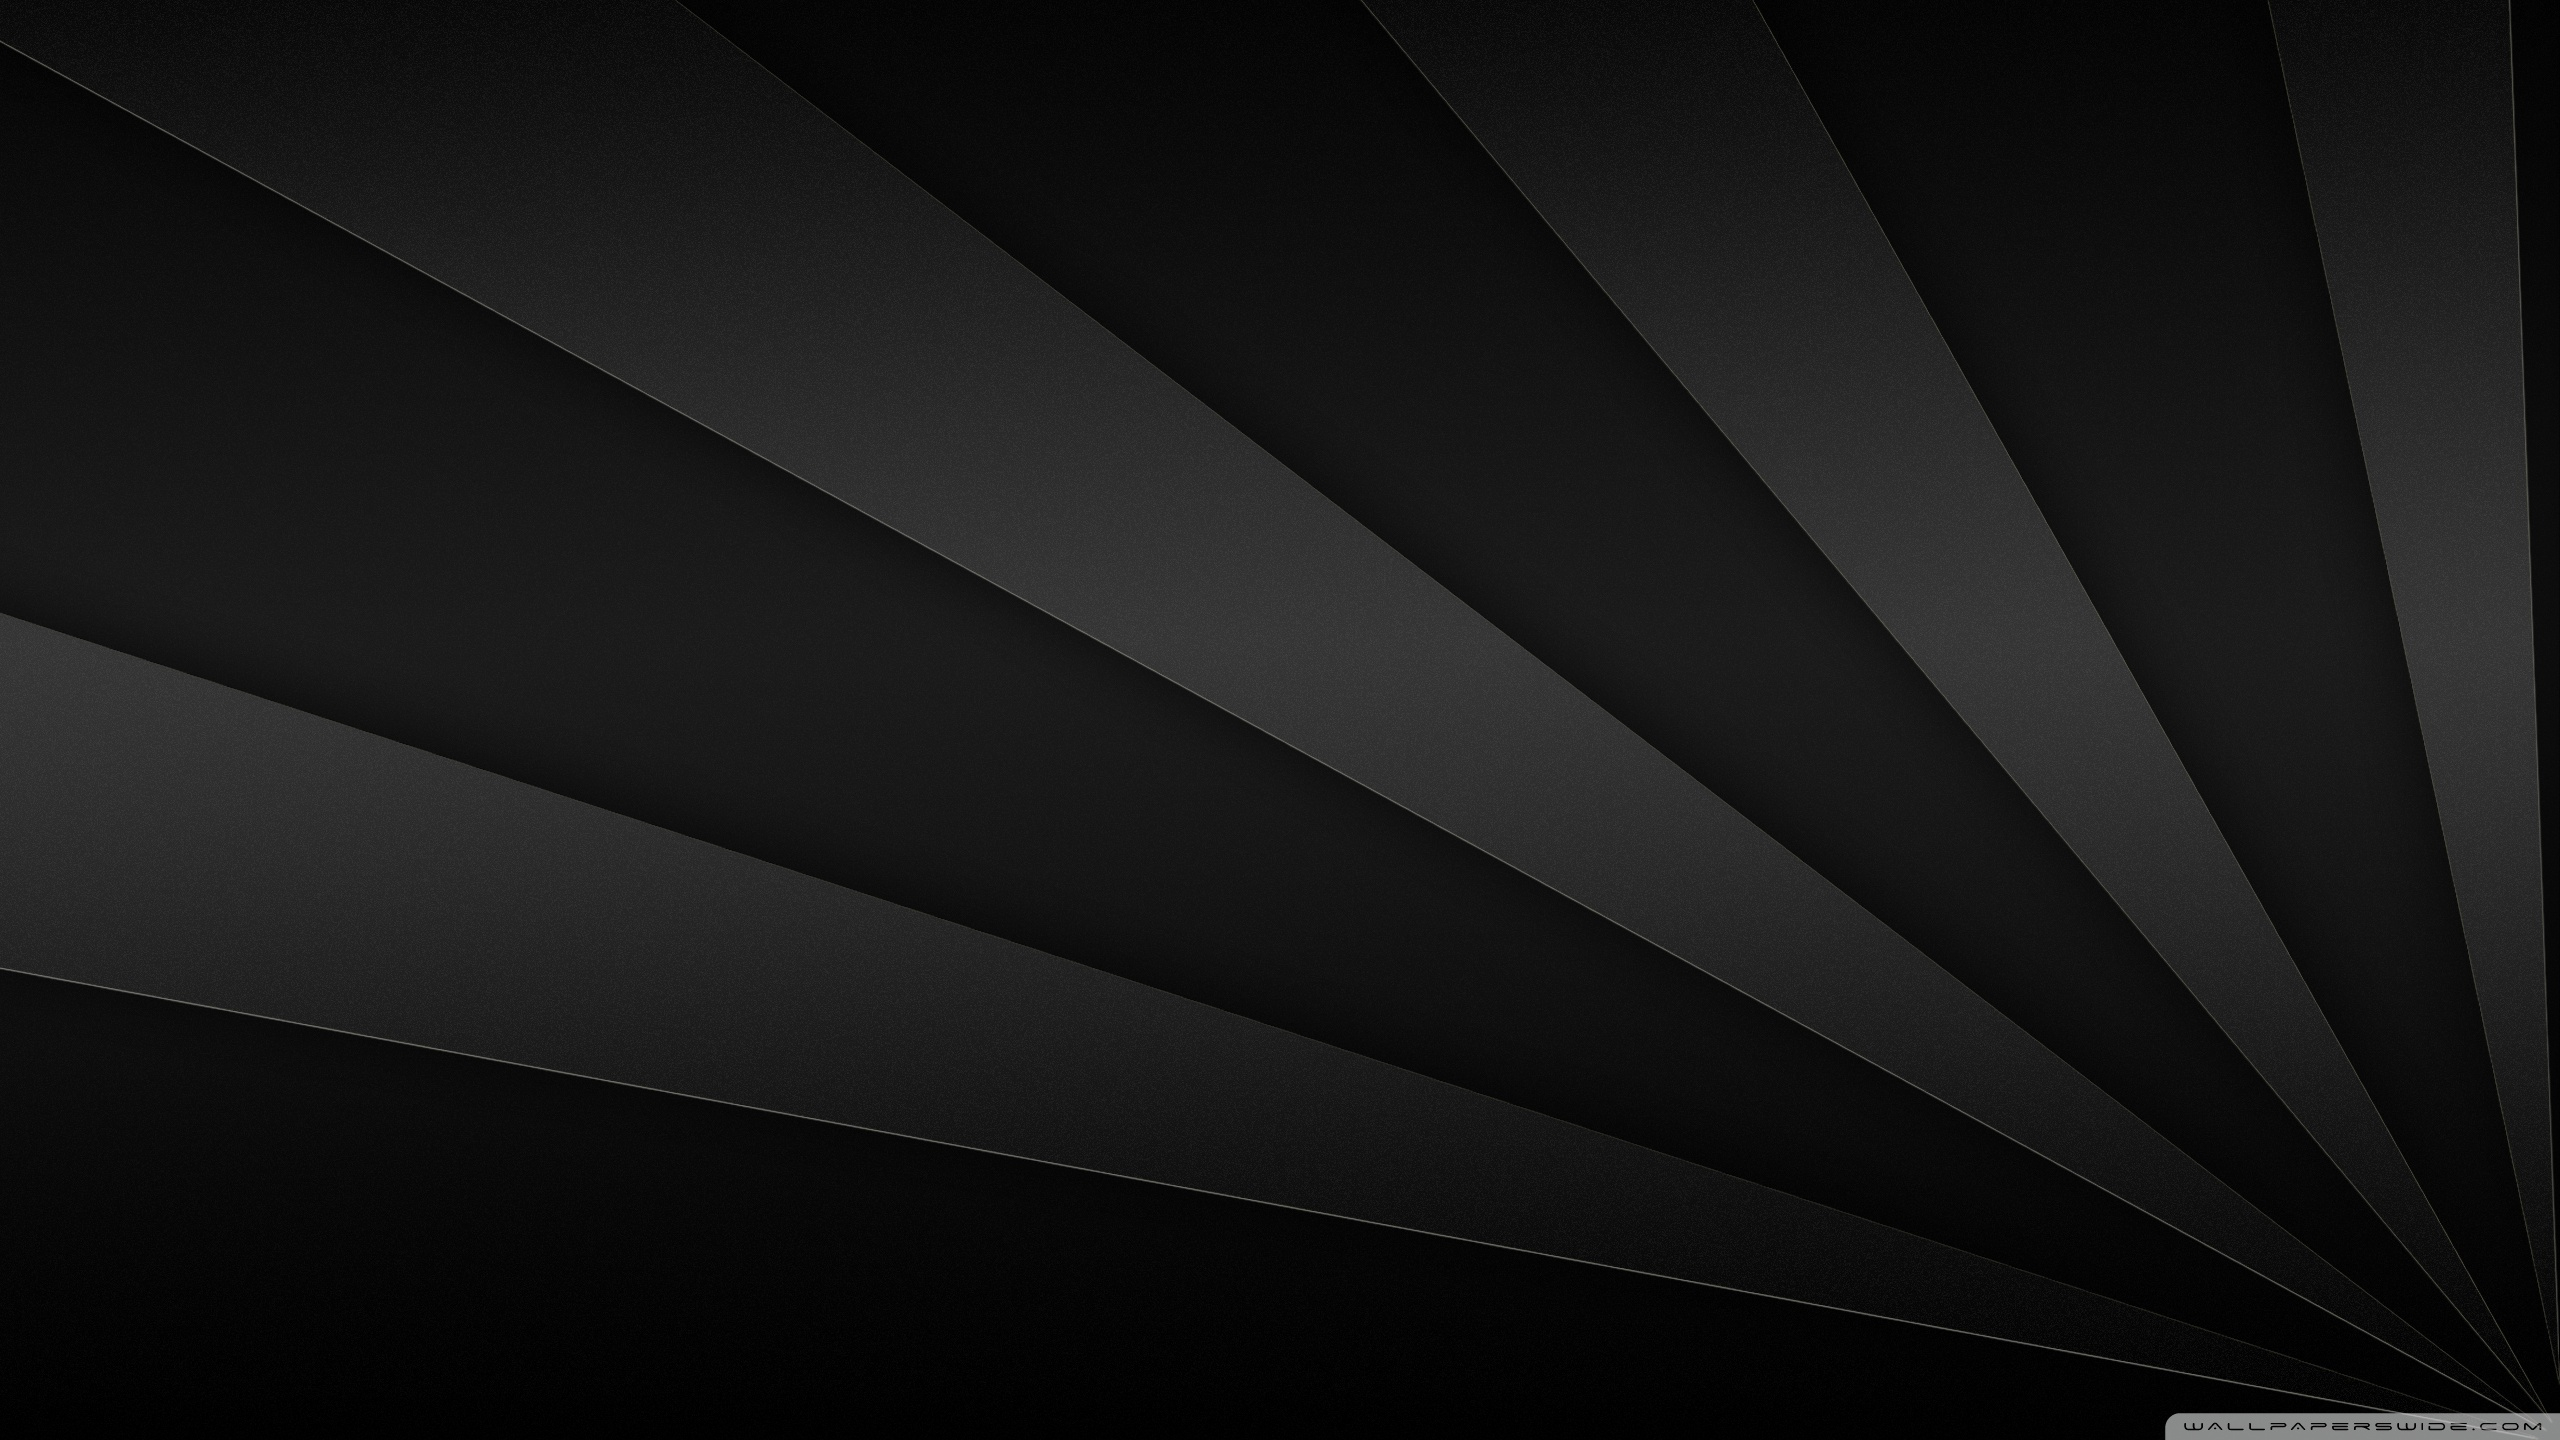 2560 x 1440 wallpaper black wallpapersafari for Ecran pc 2560 x 1440